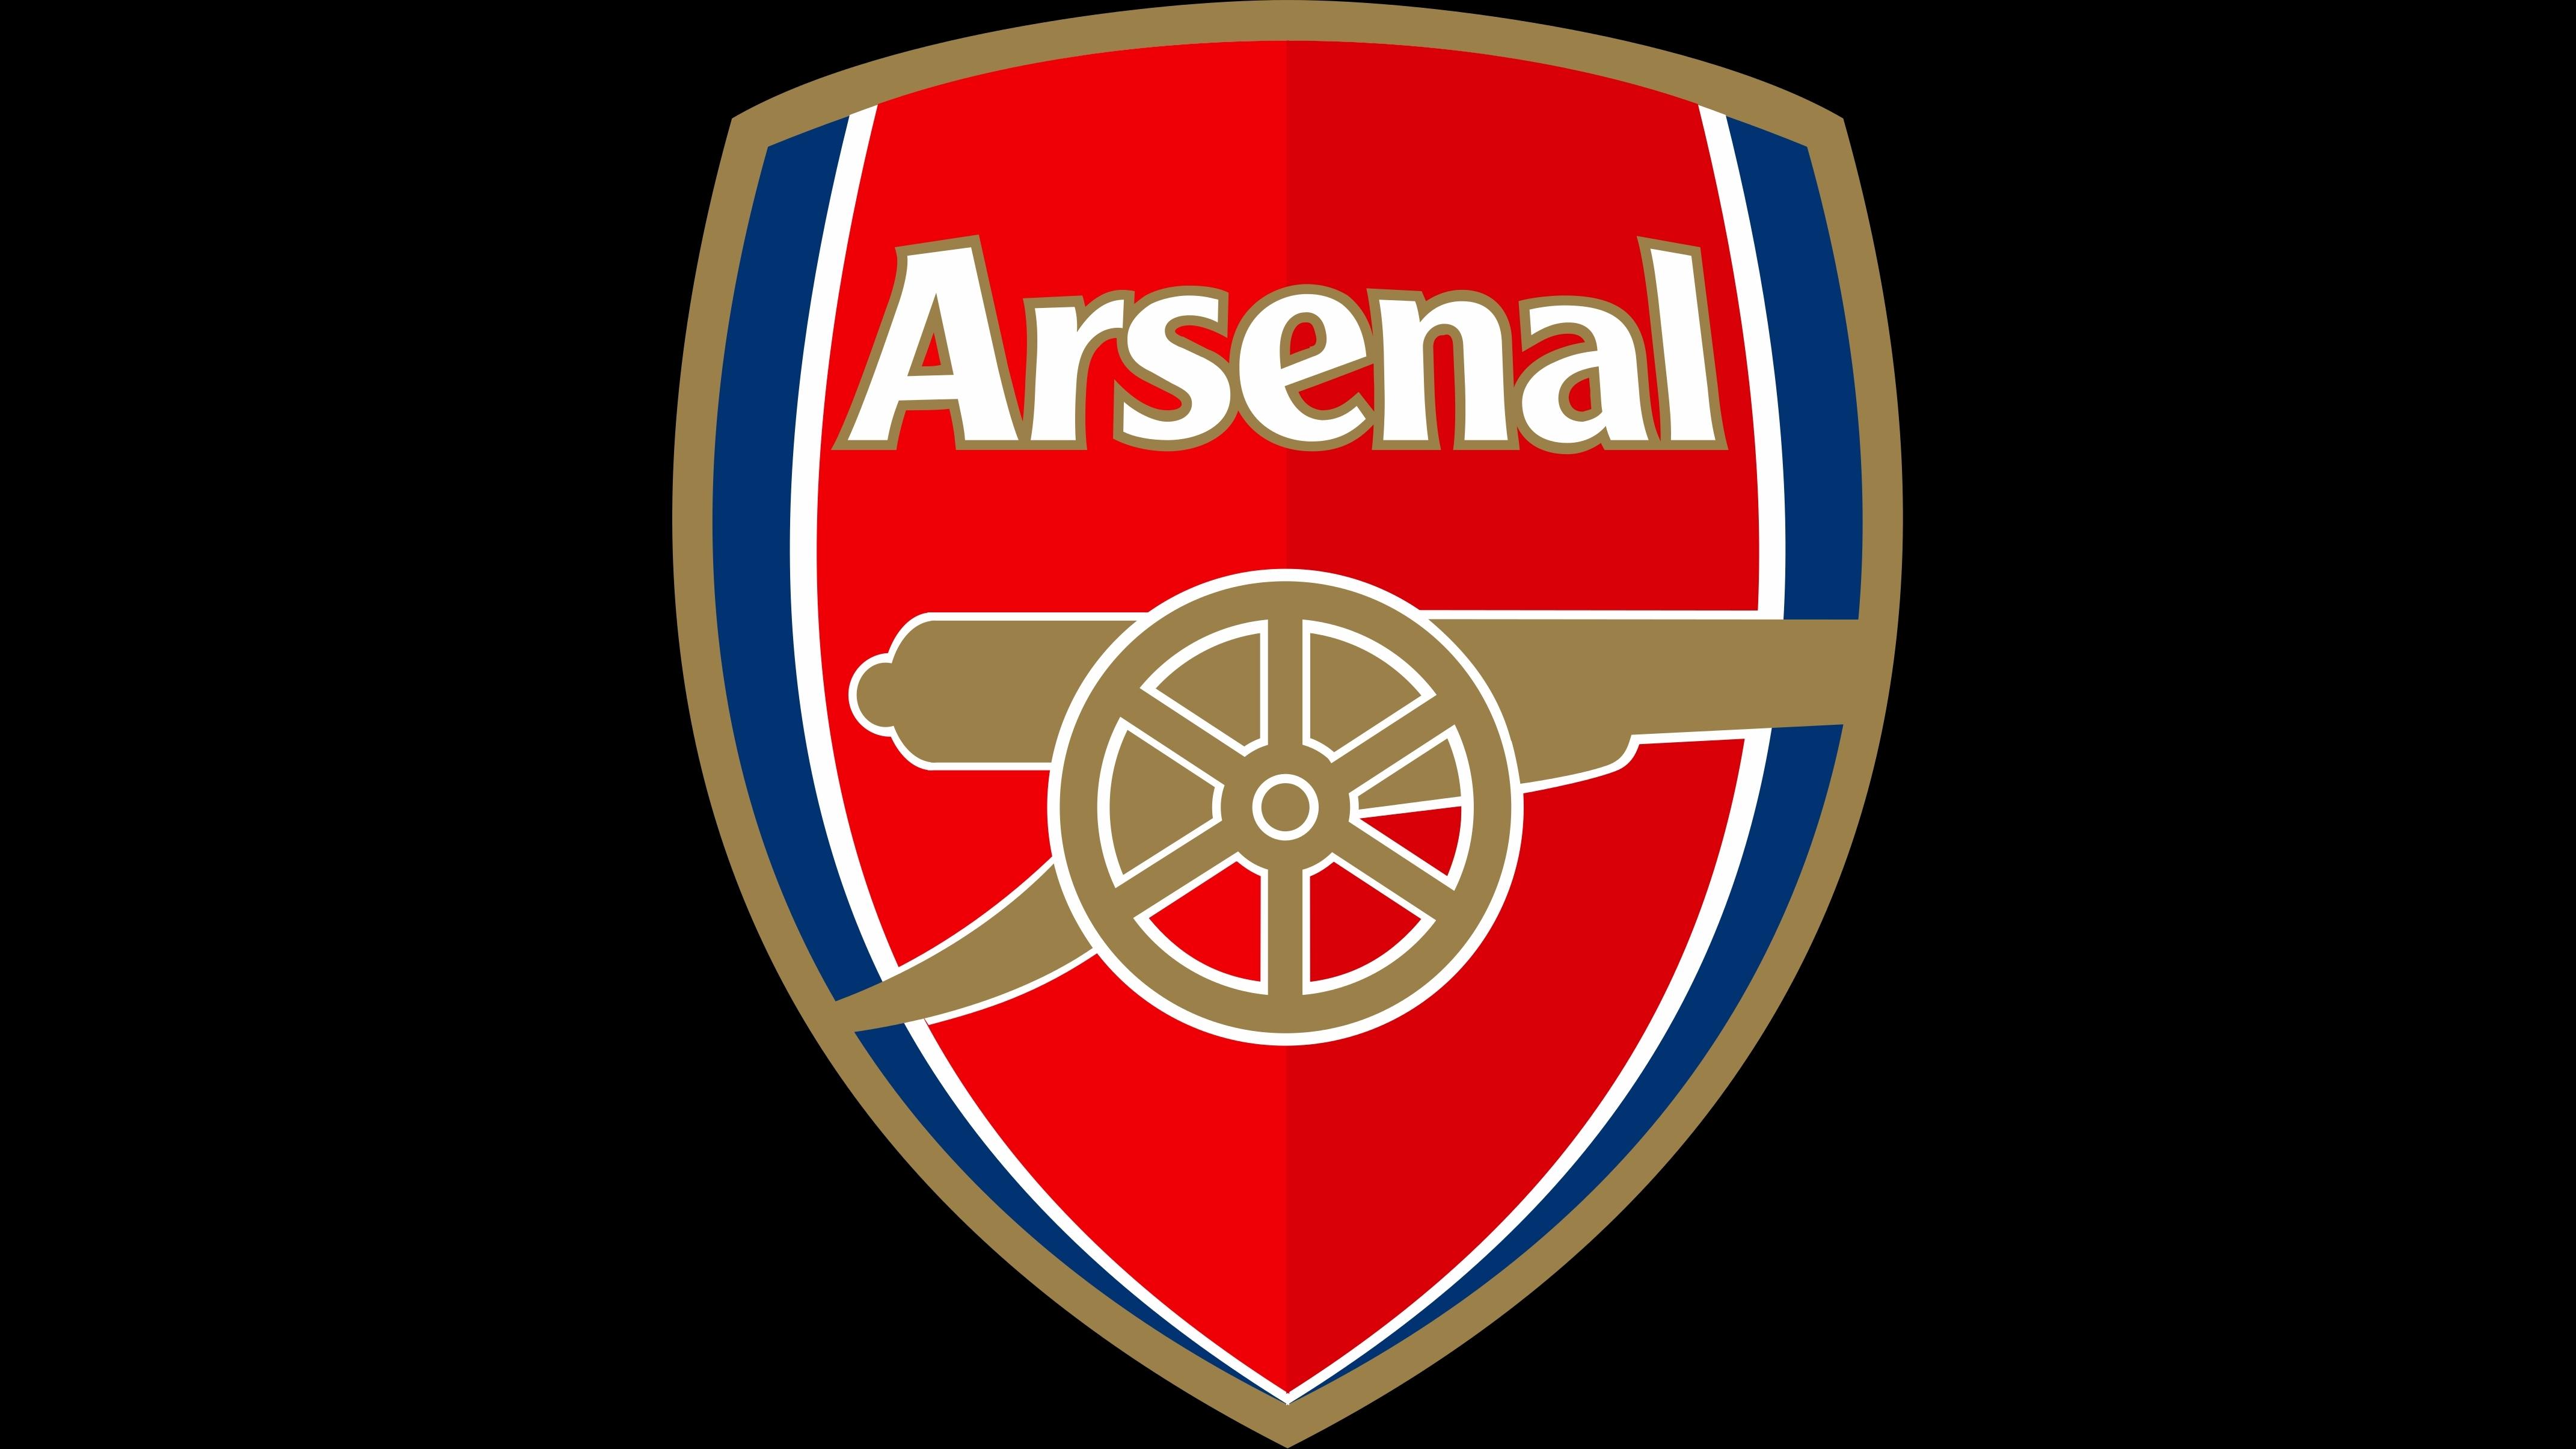 Arsenal Wallpaper 4k: Arsenal F.C. 4k Ultra HD Wallpaper